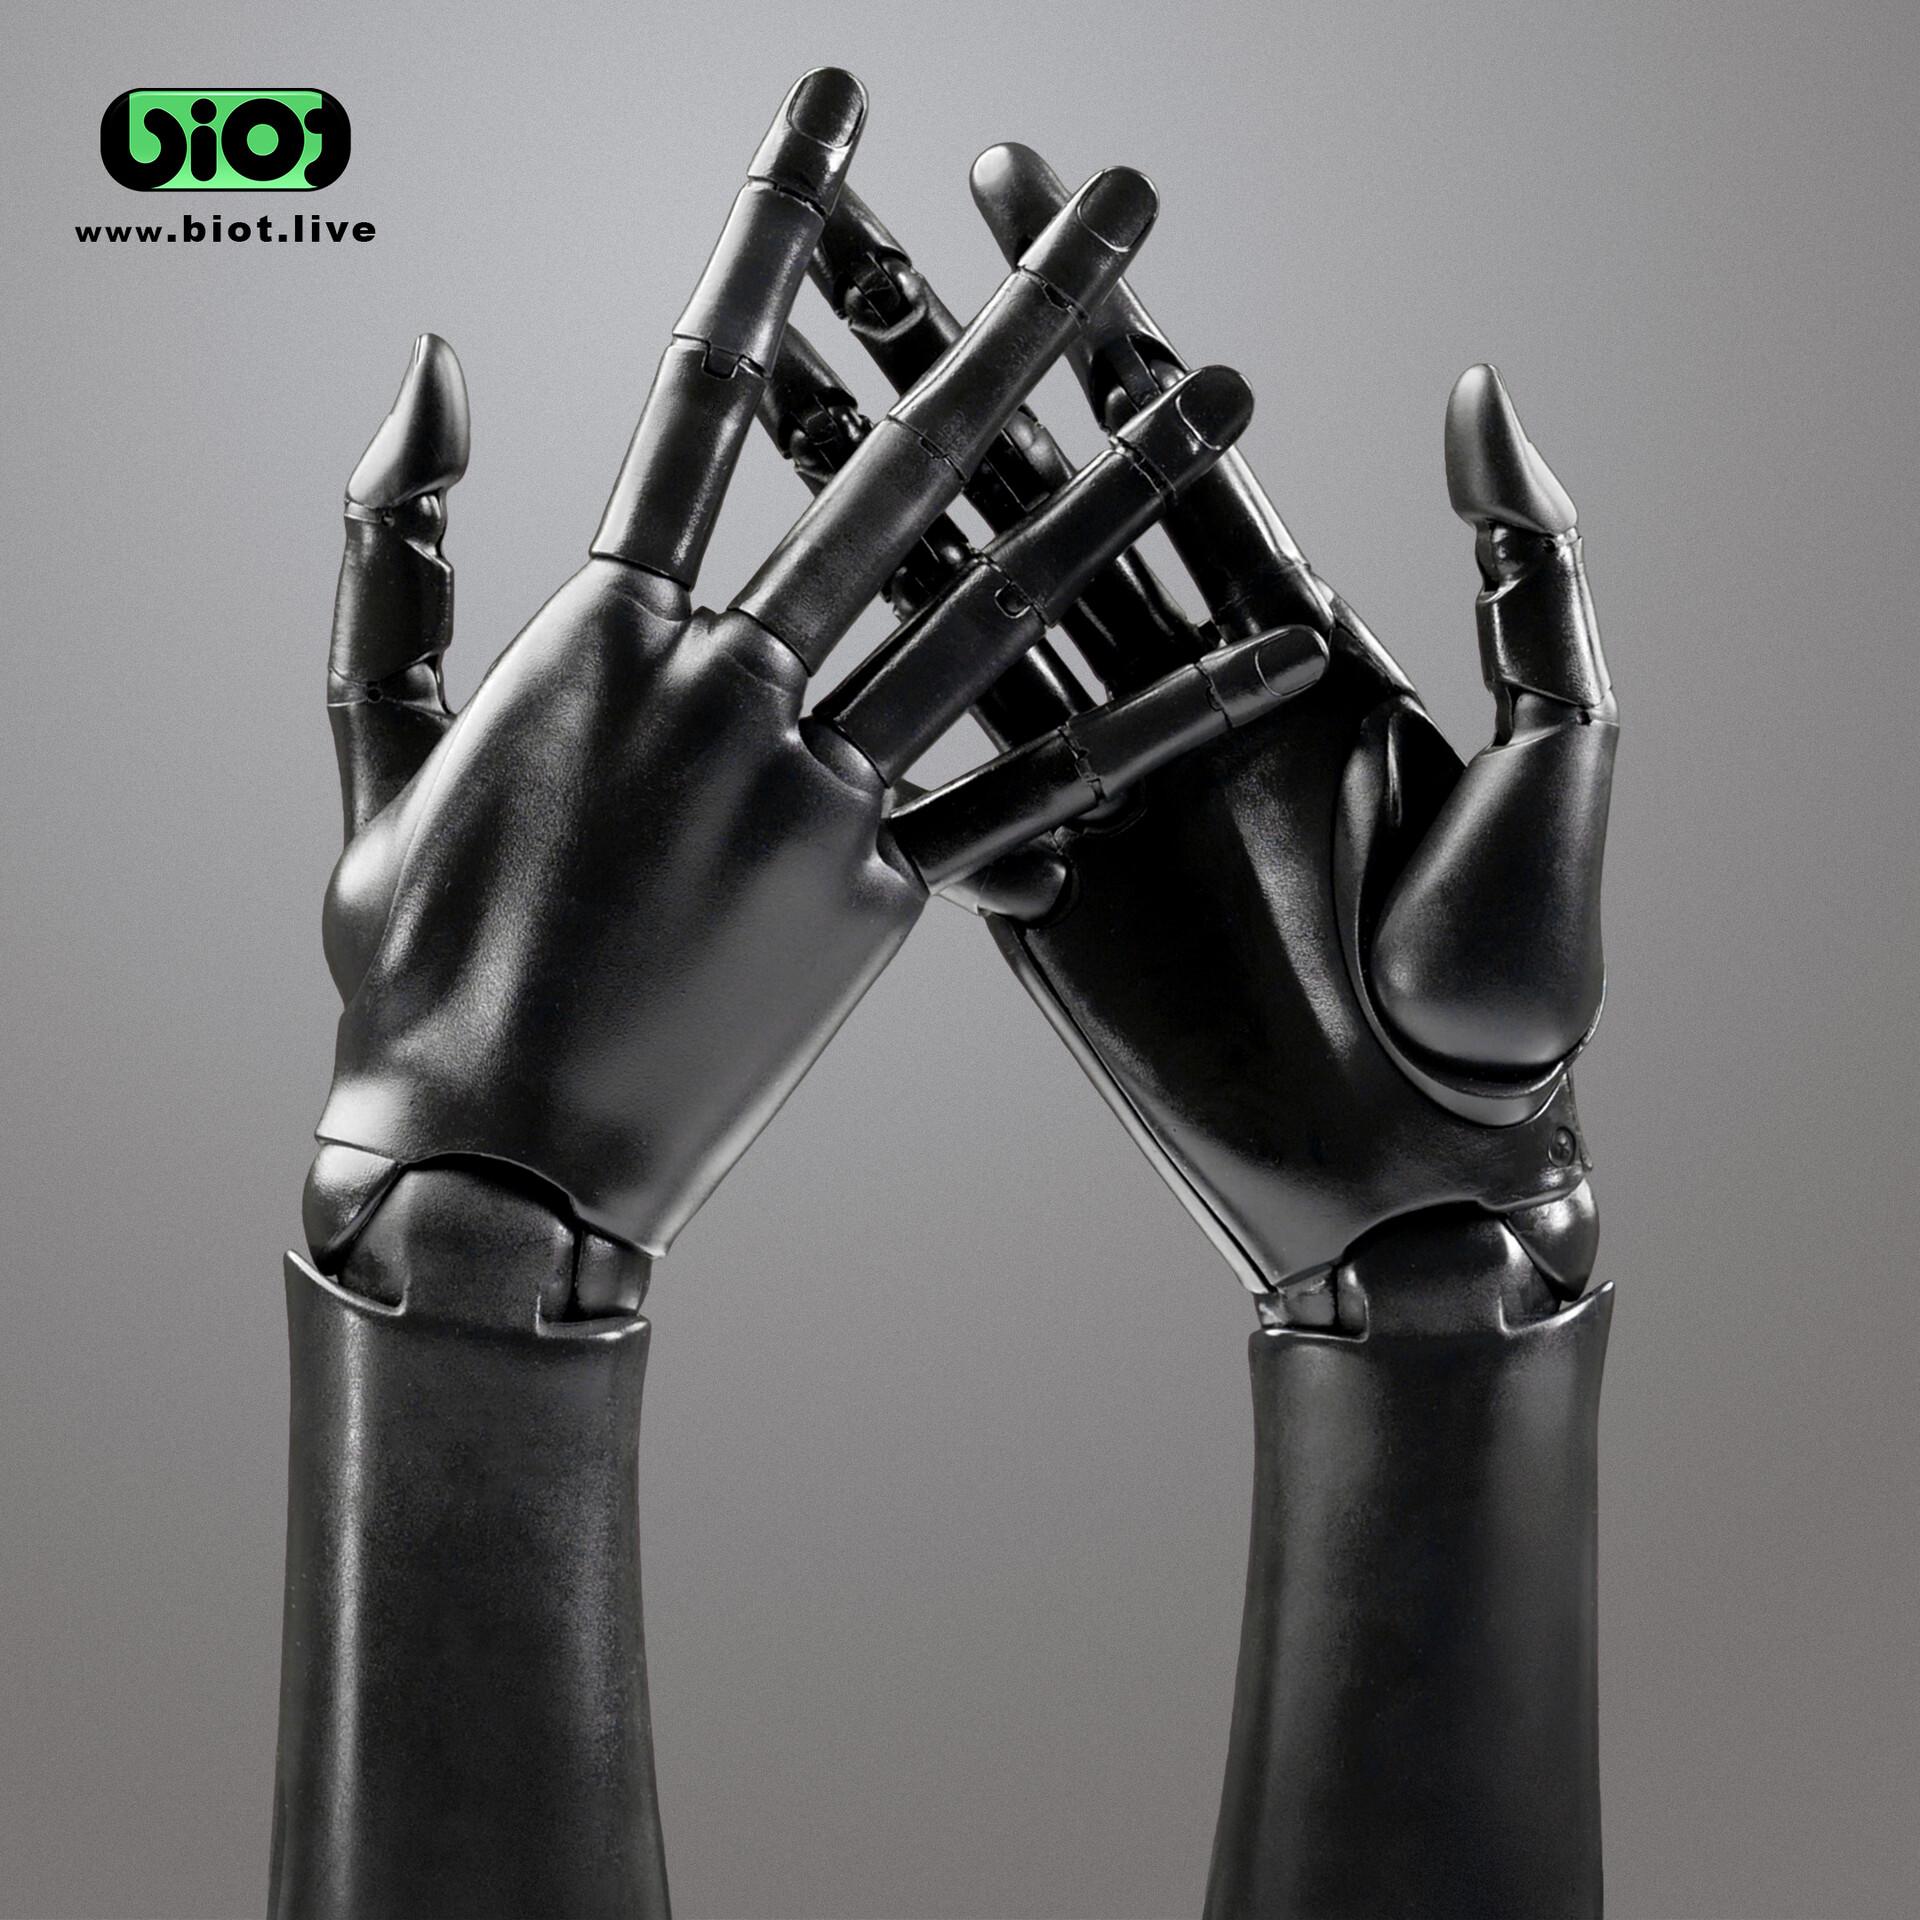 Pair of bionic hands